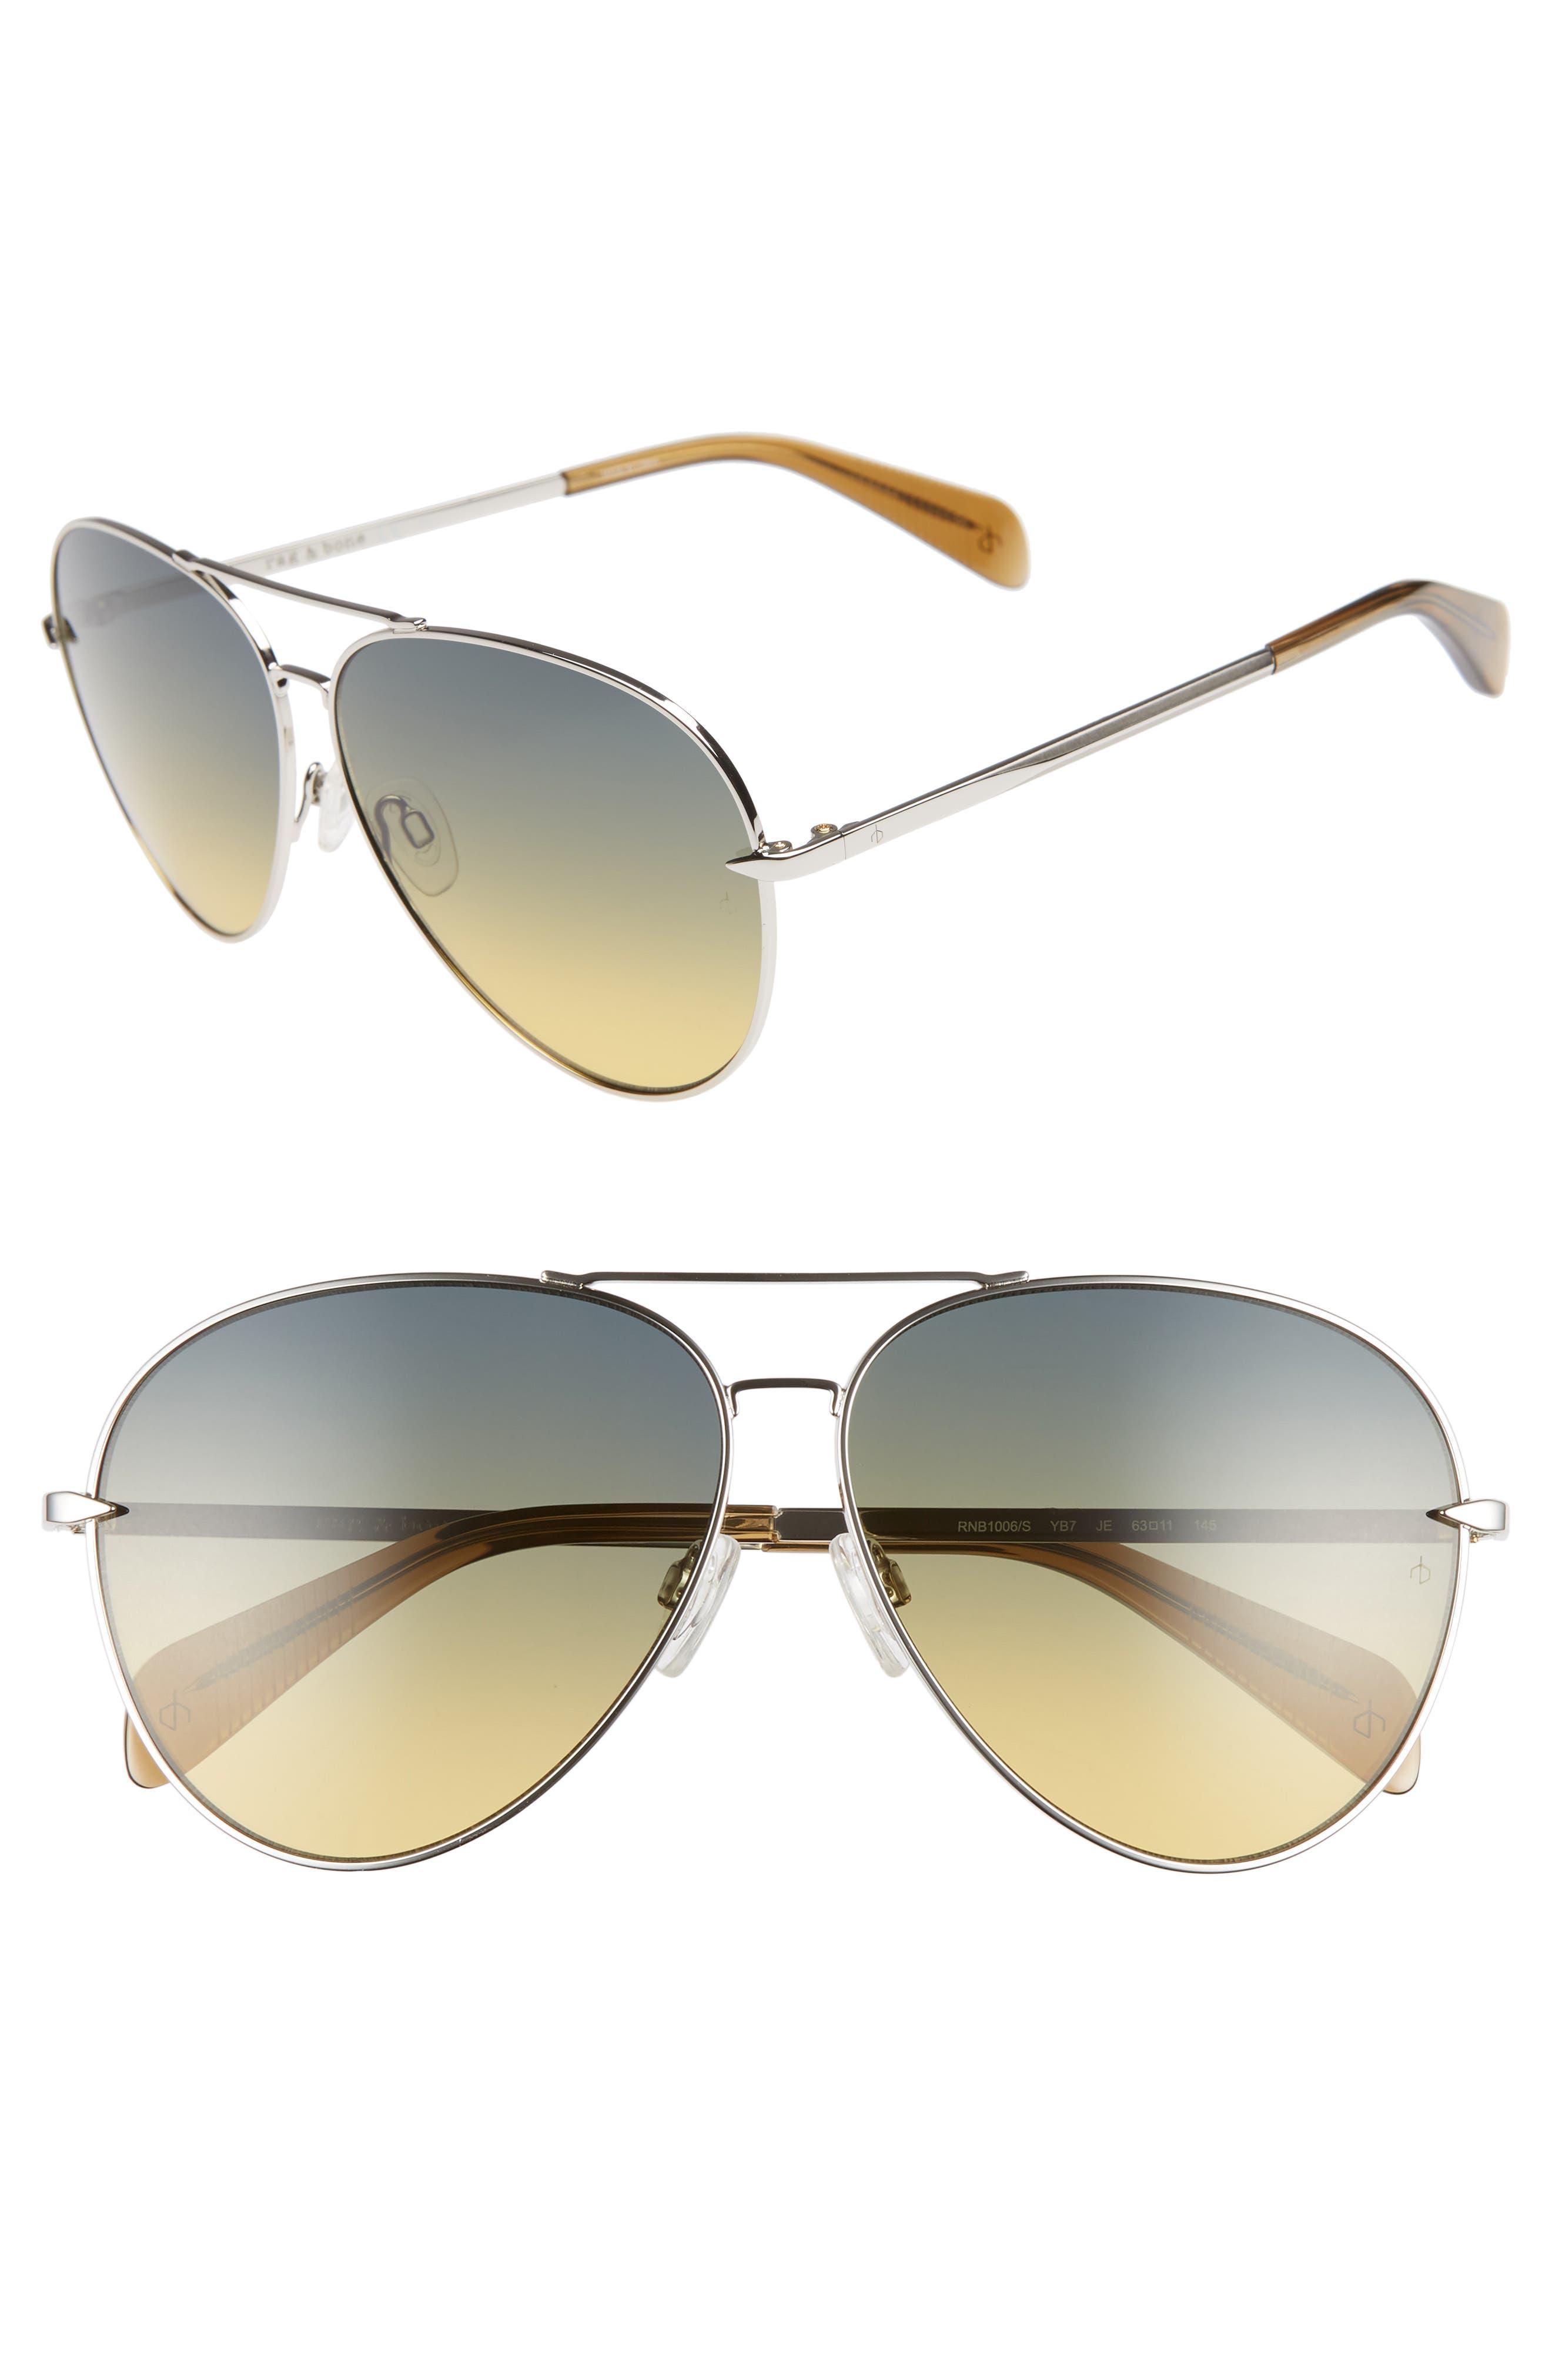 RAG & BONE, 63mm Oversize Aviator Sunglasses, Main thumbnail 1, color, SILVER